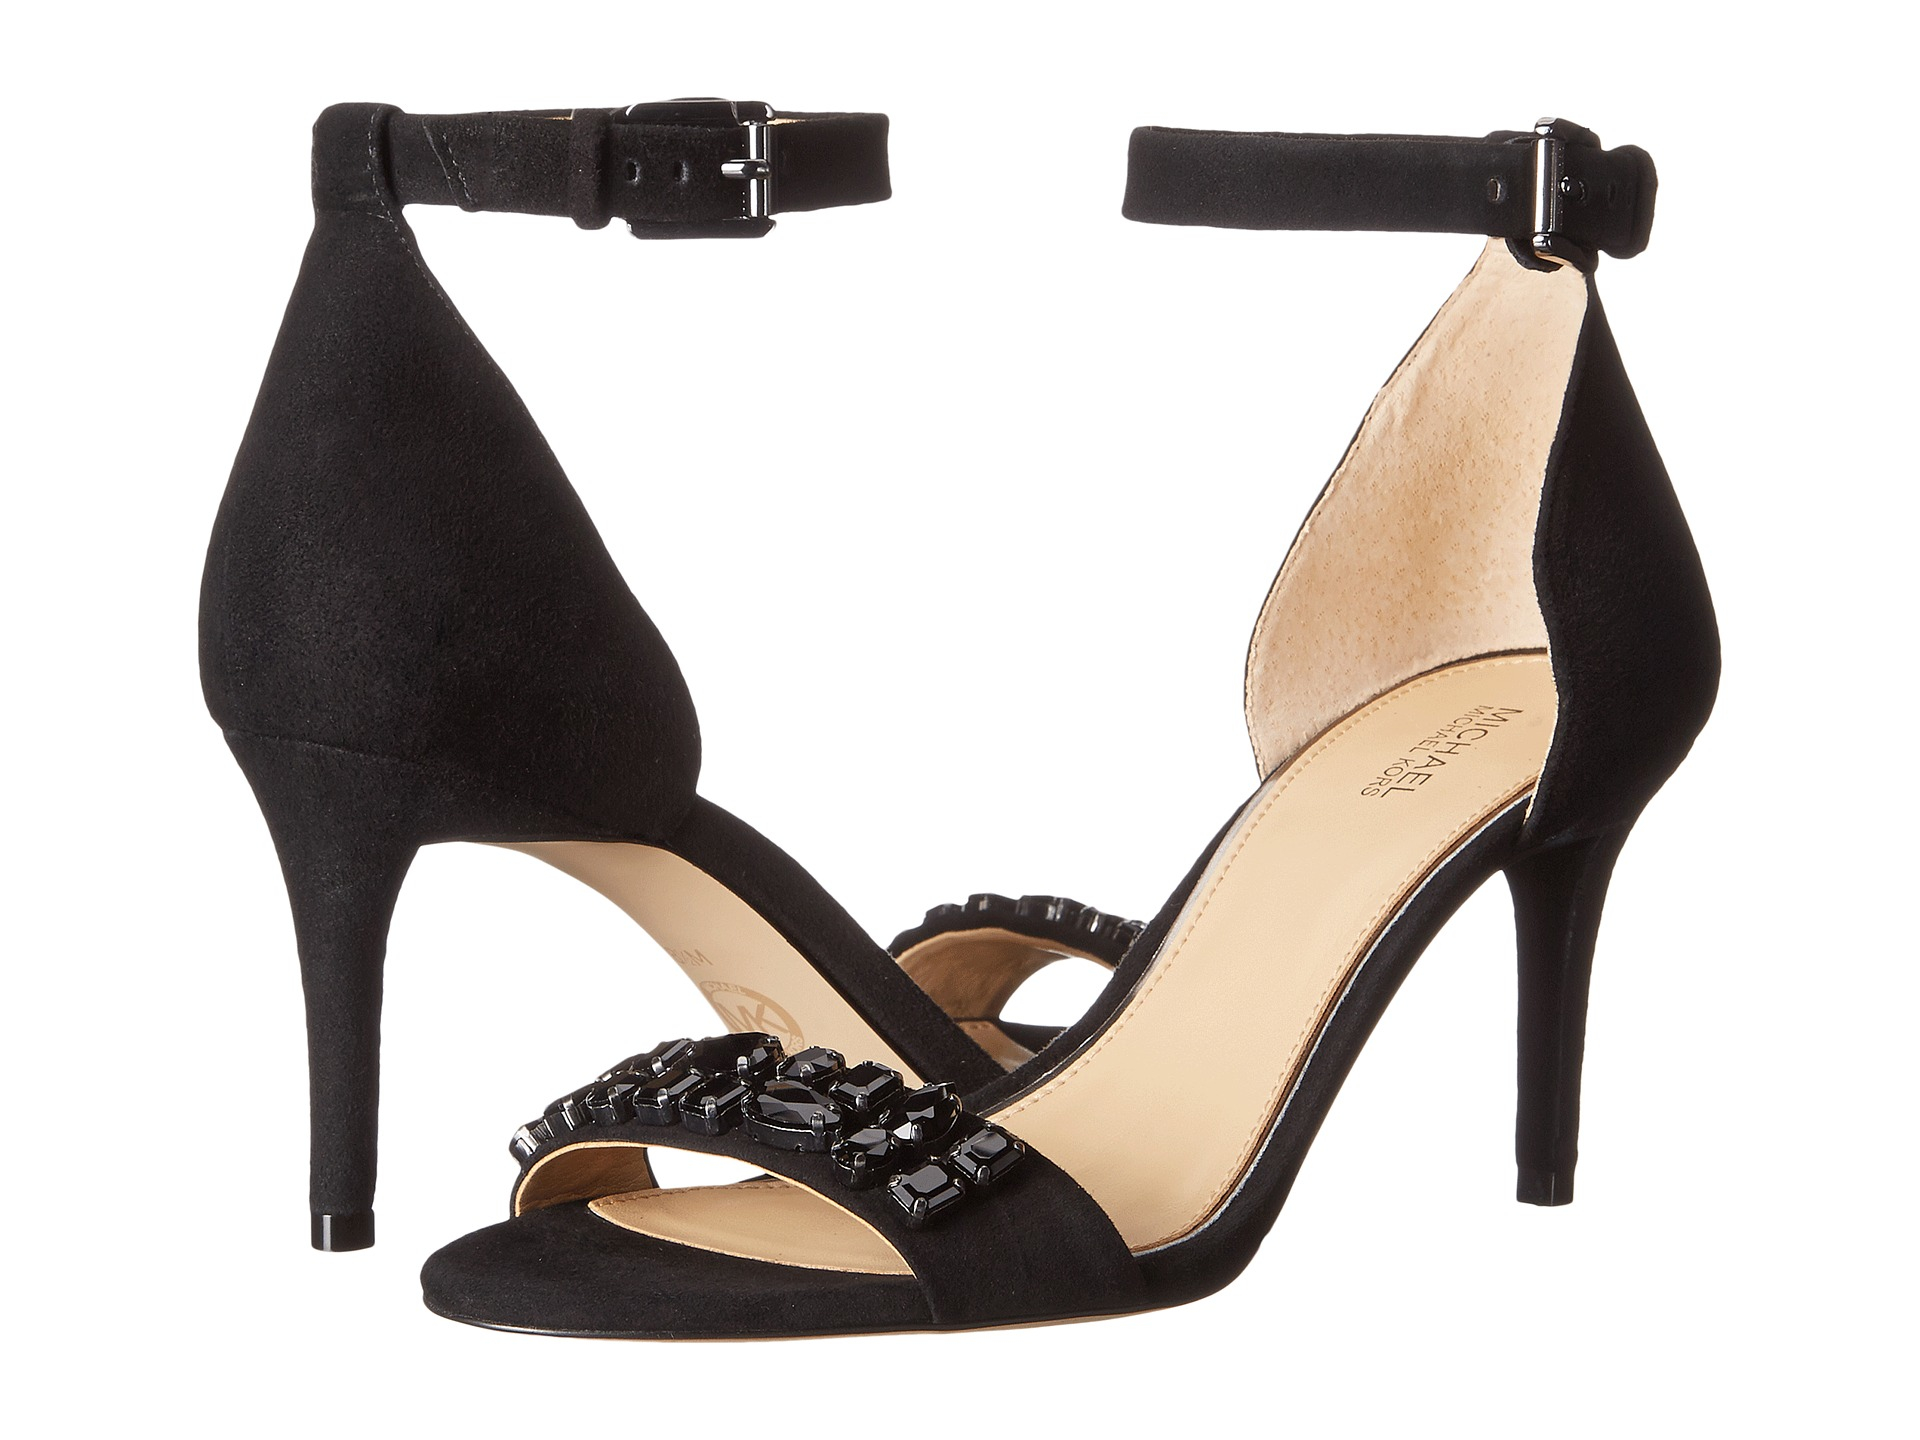 Michael Kors Black Platform Shoes